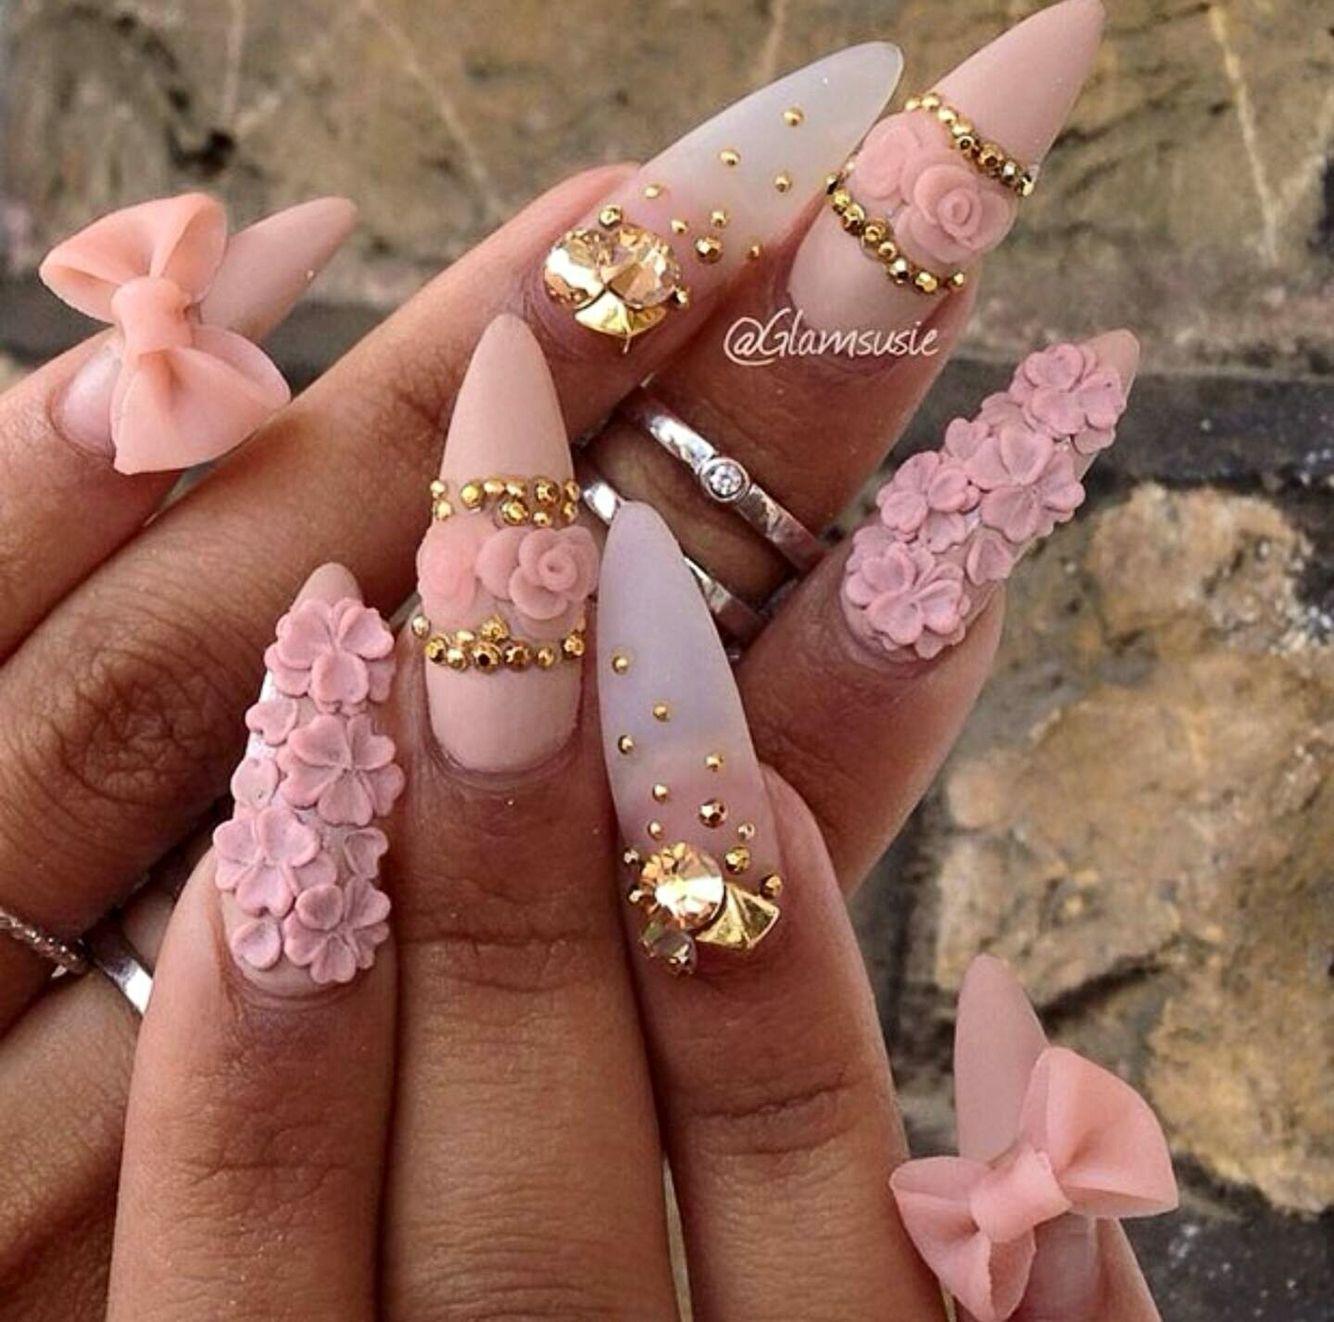 pink floral stiletto nails w bows - Pin By Maya Rogers On Nails Pinterest Nail Nail, Makeup And